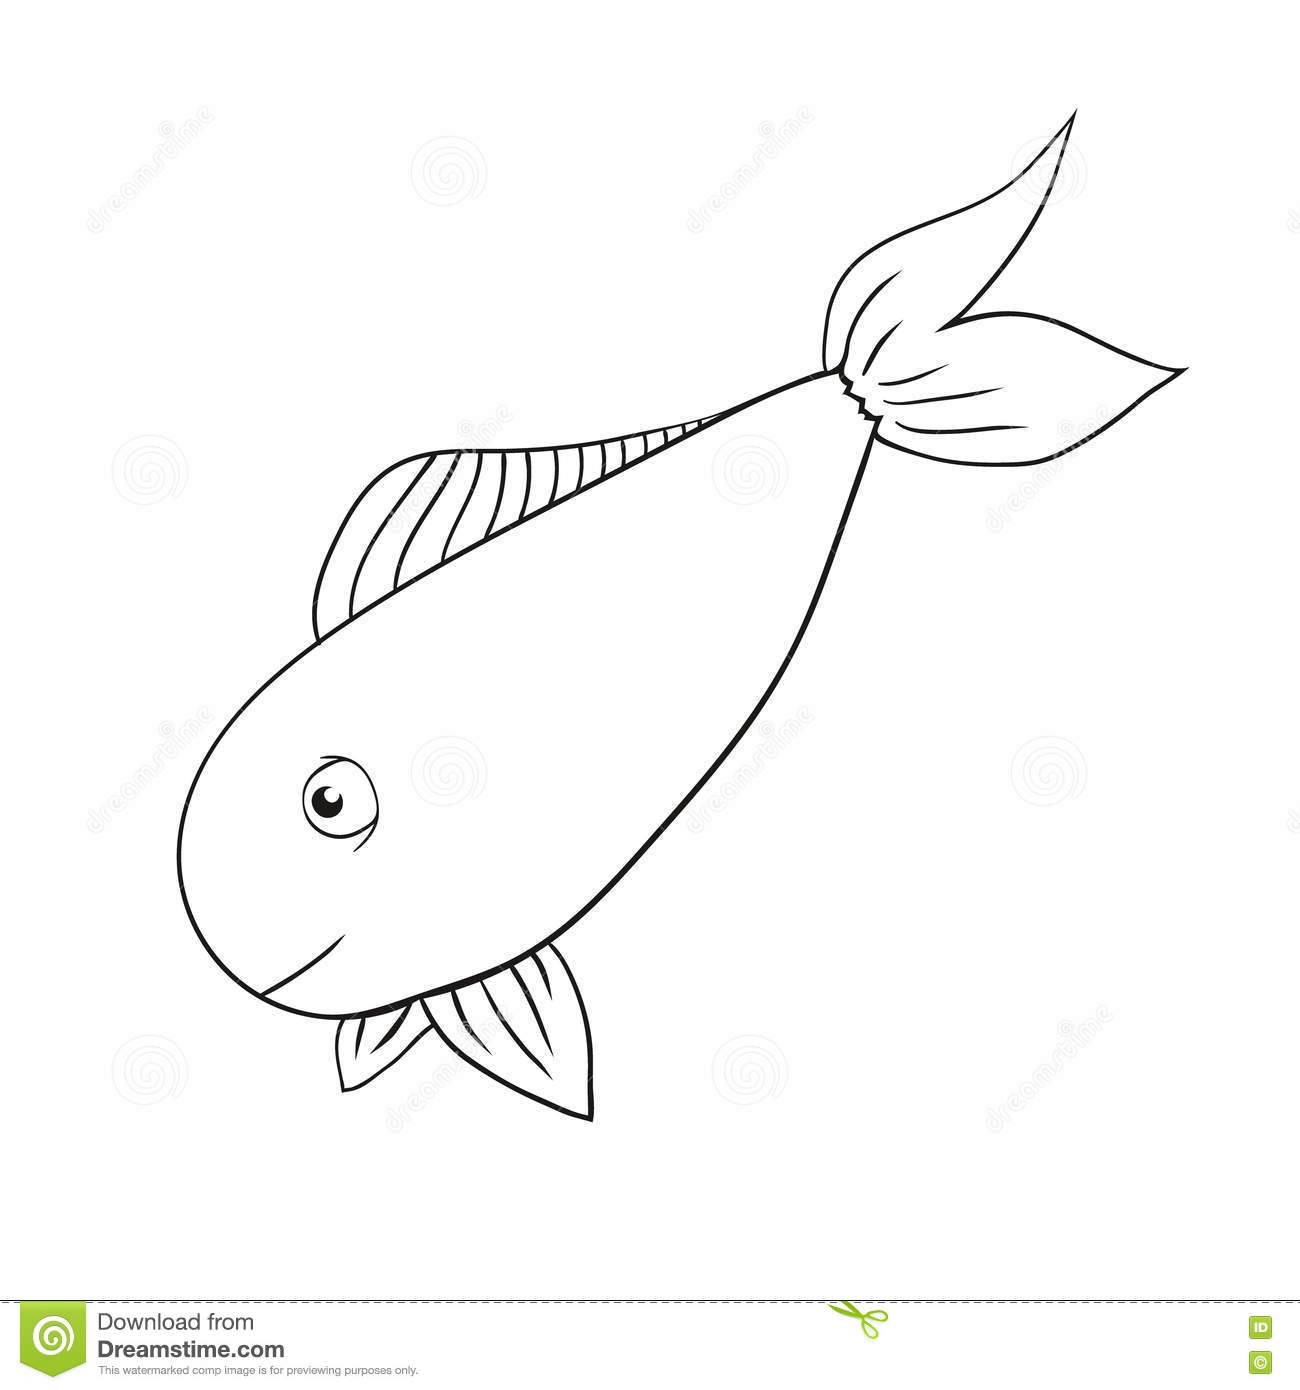 Vector Hand Drawn Fish Stock Vector  Illustration Of Drawn